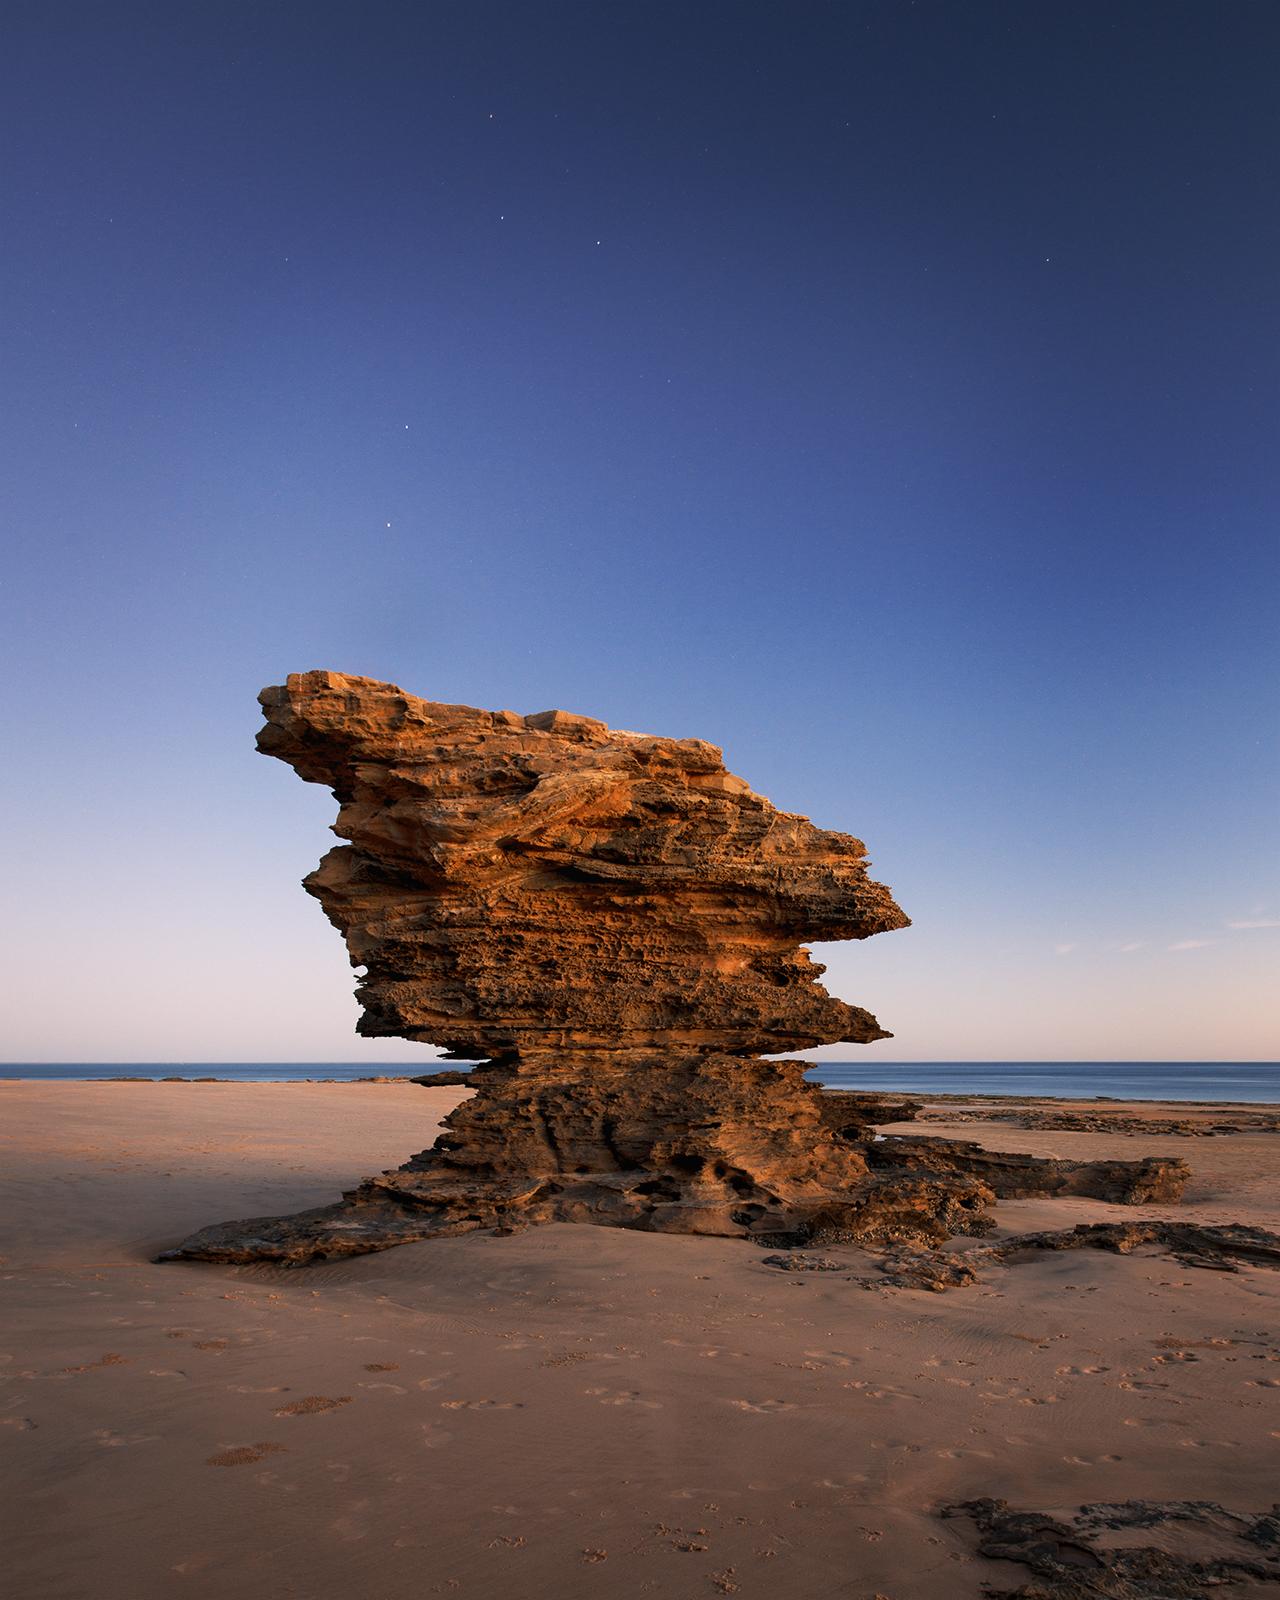 Broome Sandstone